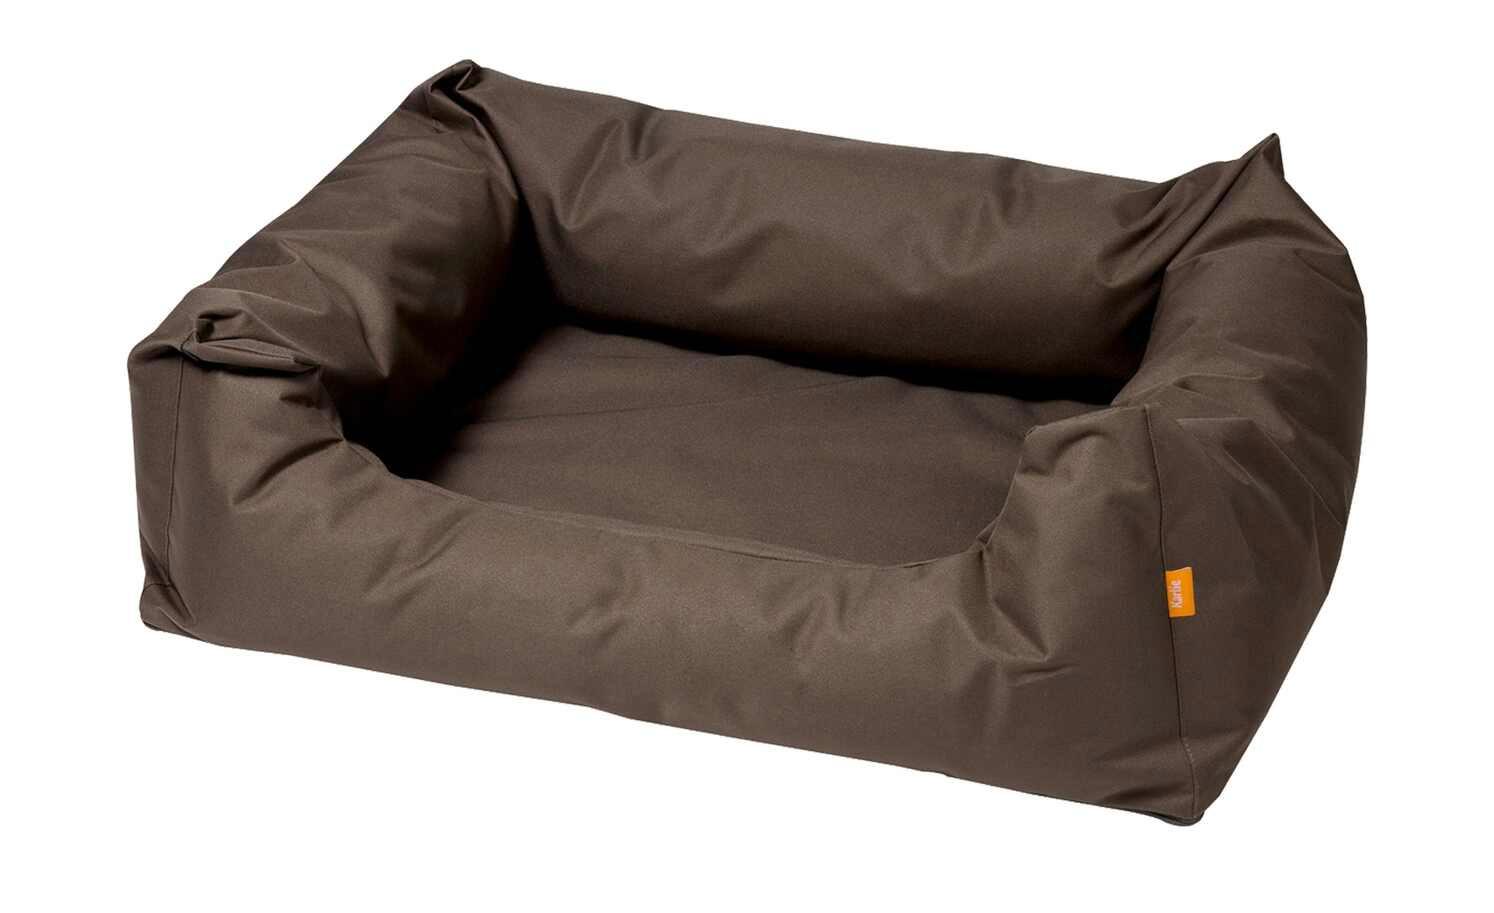 Hundebett / Hundekissen Flamingo Dreambay 120x95cm dunkelbraun Bild 1